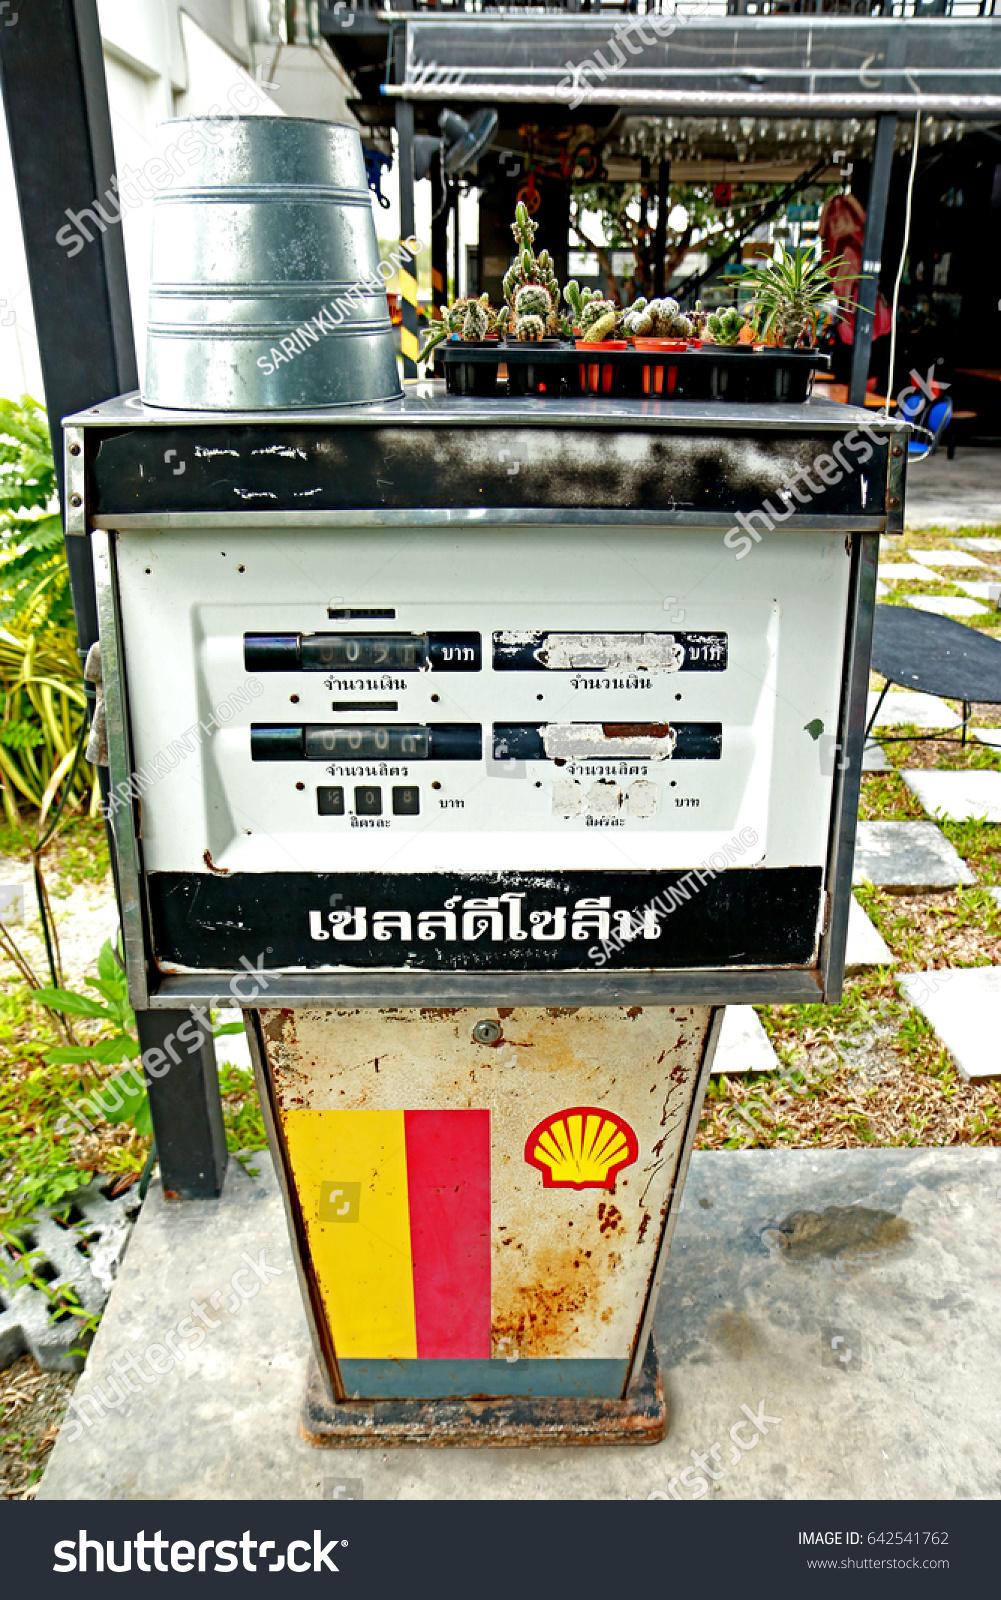 Chonburithailandmarch 27 Decorative Accessories Oil Dispenser Stock